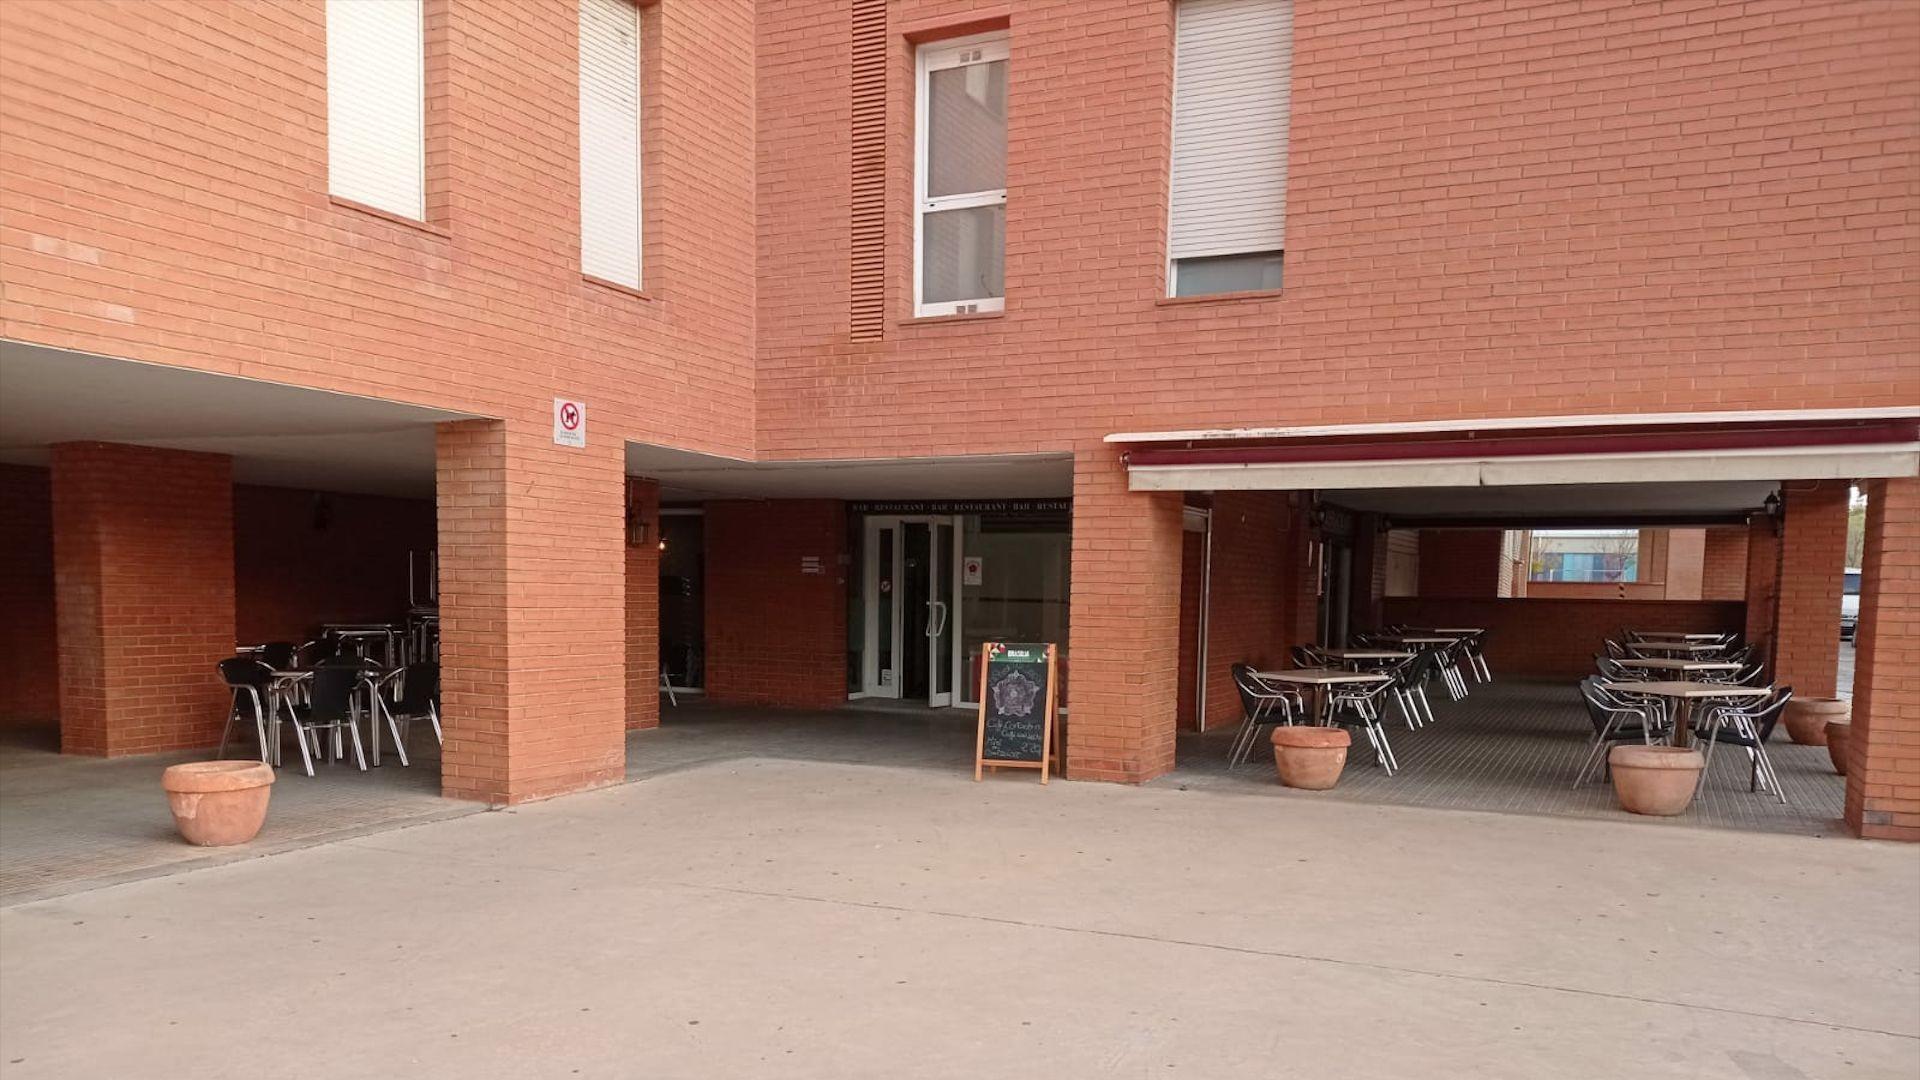 Hamburguesería Reus, Tarragona